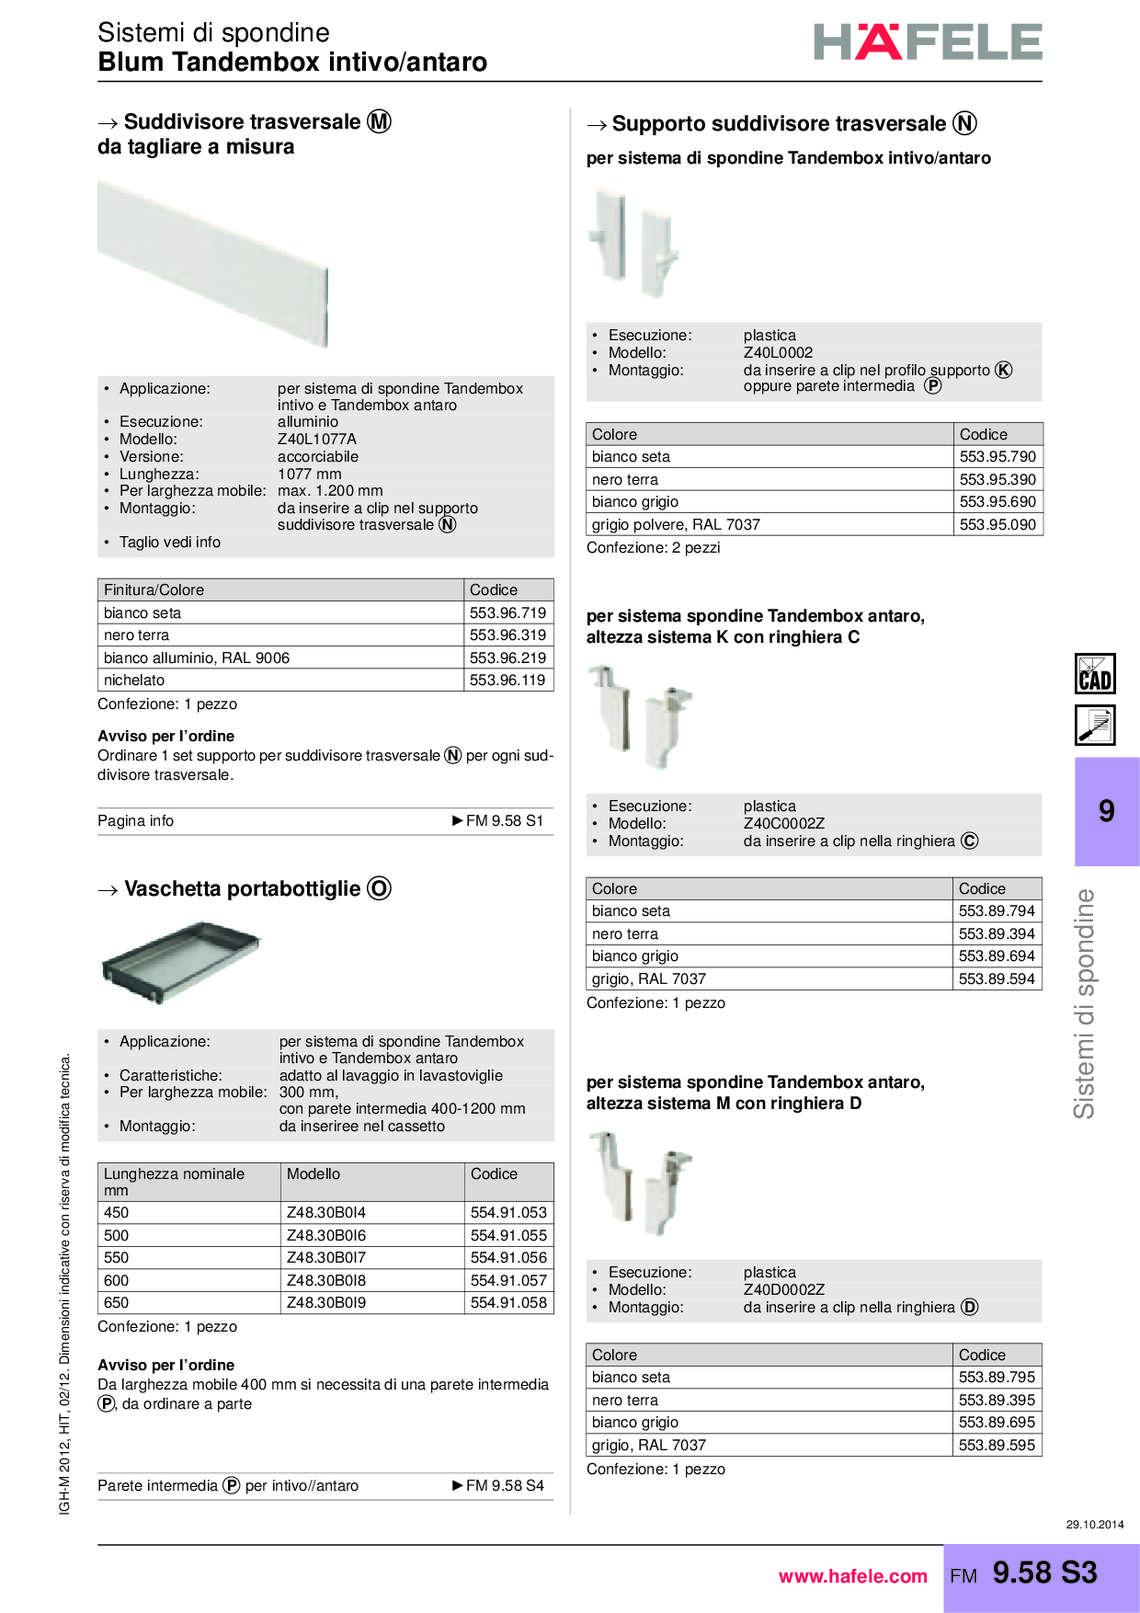 hafele-spondine-e-guide-per-mobili_40_096.jpg